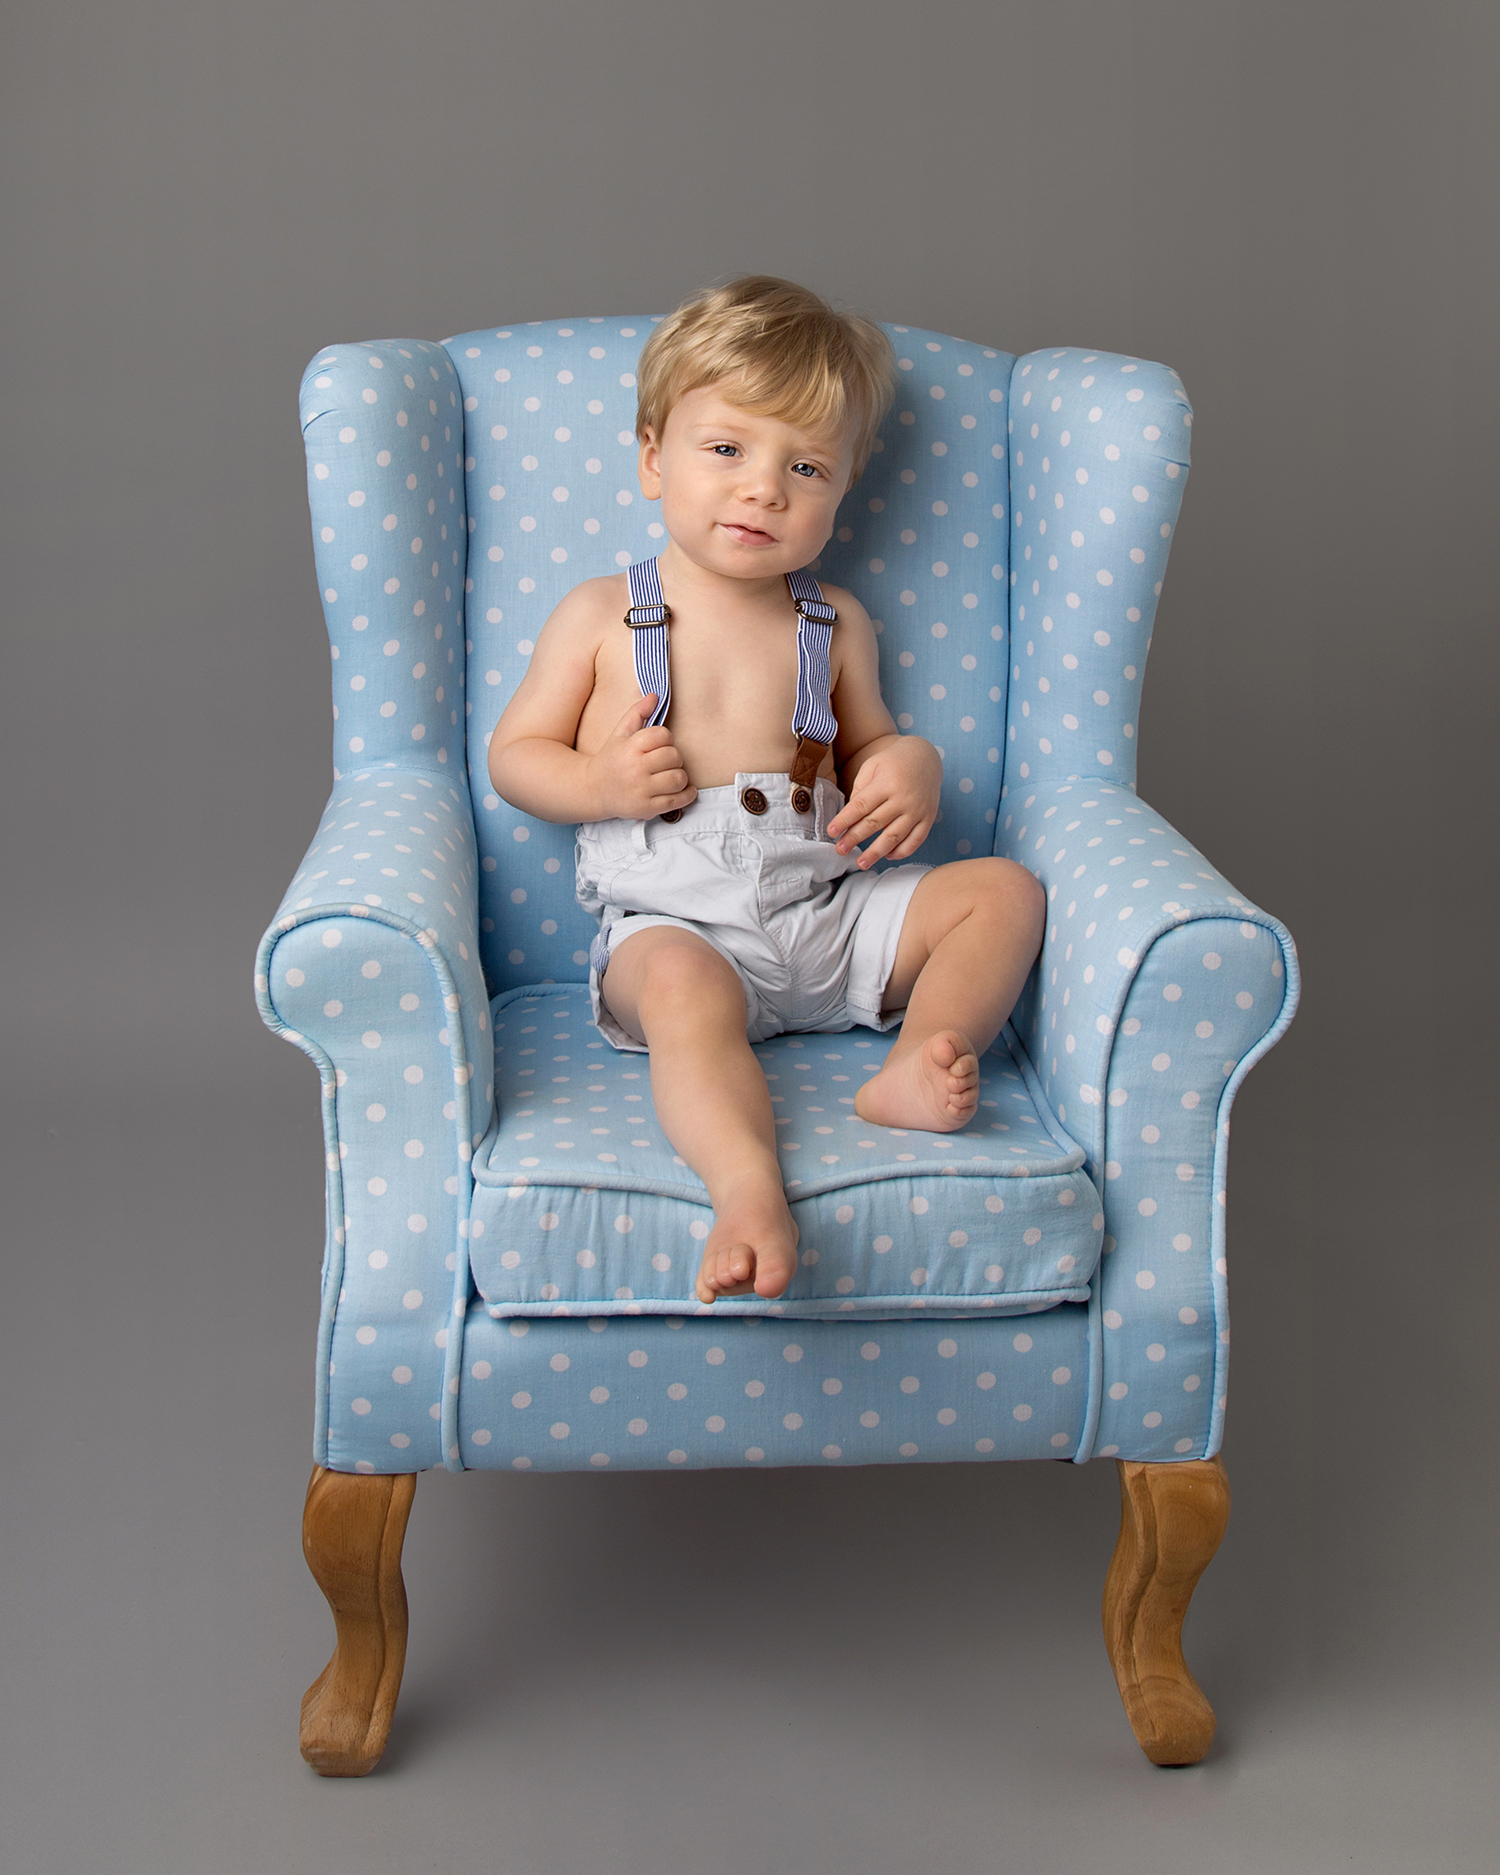 Children's photographer Elisabeth Franco Photographer based in Gloucester